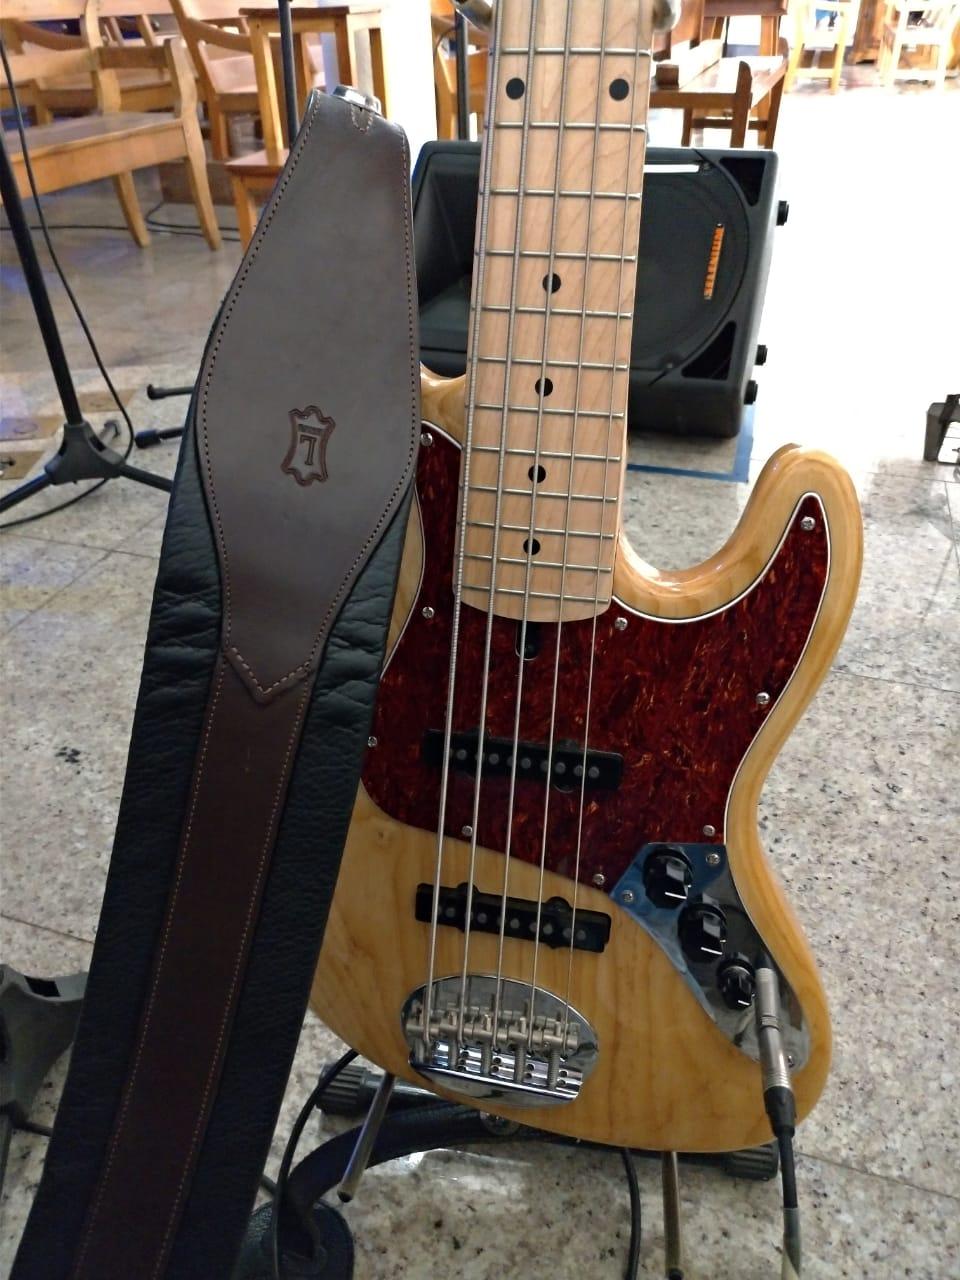 Fe2O3 Bass - Página 2 Whatsa11